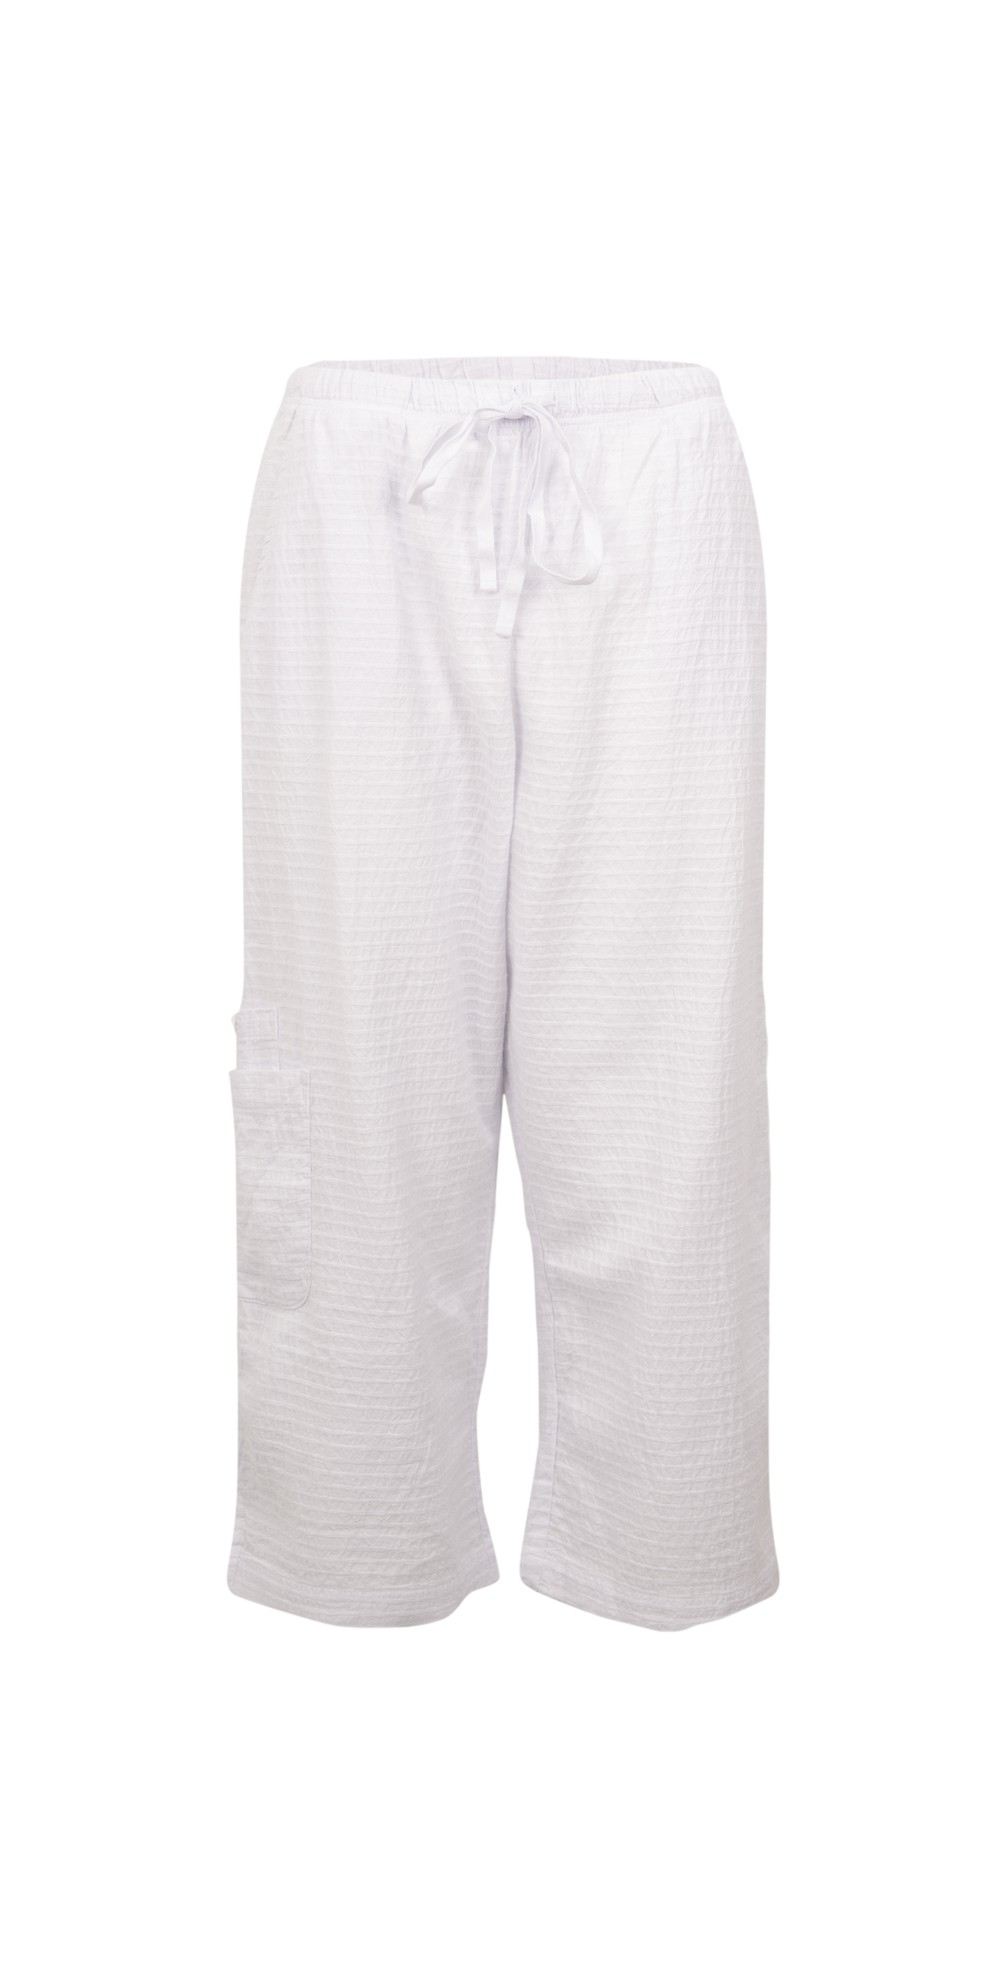 3/4 Wide Leg Trouser main image